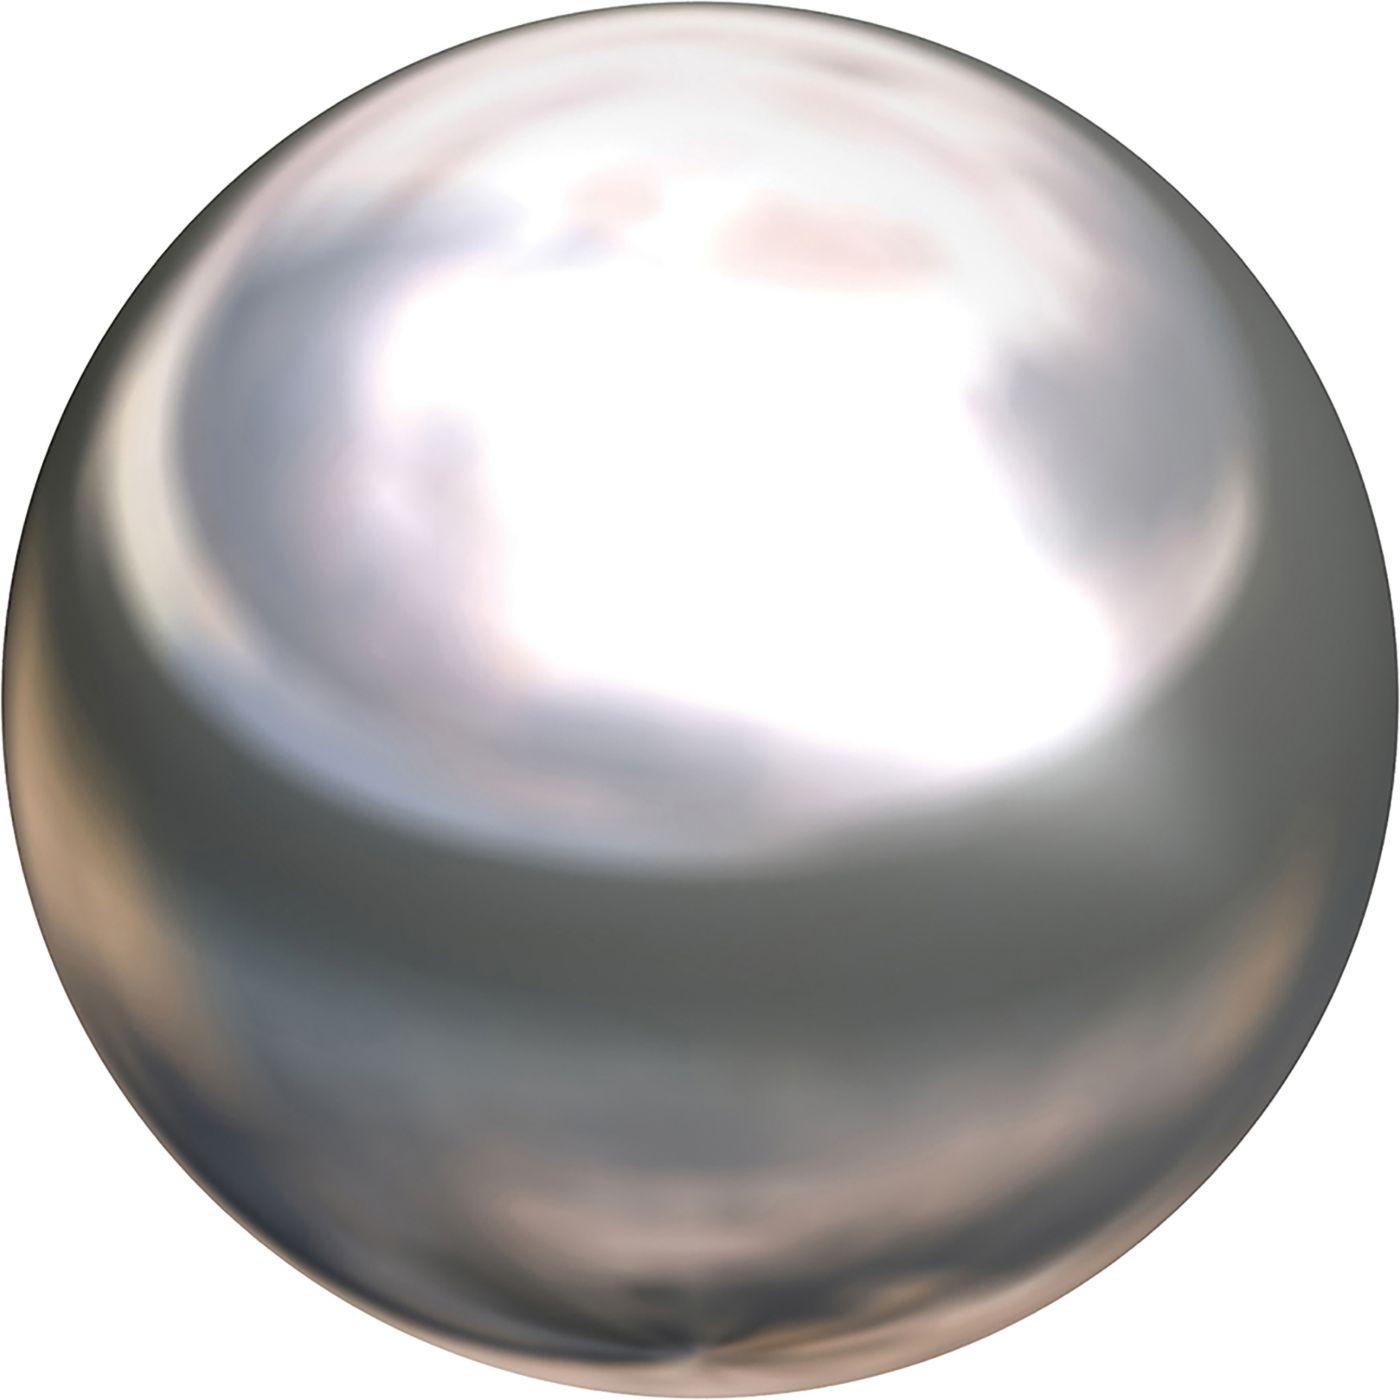 CCM Sniper's Edge Muscle Stickhandling Hockey Ball